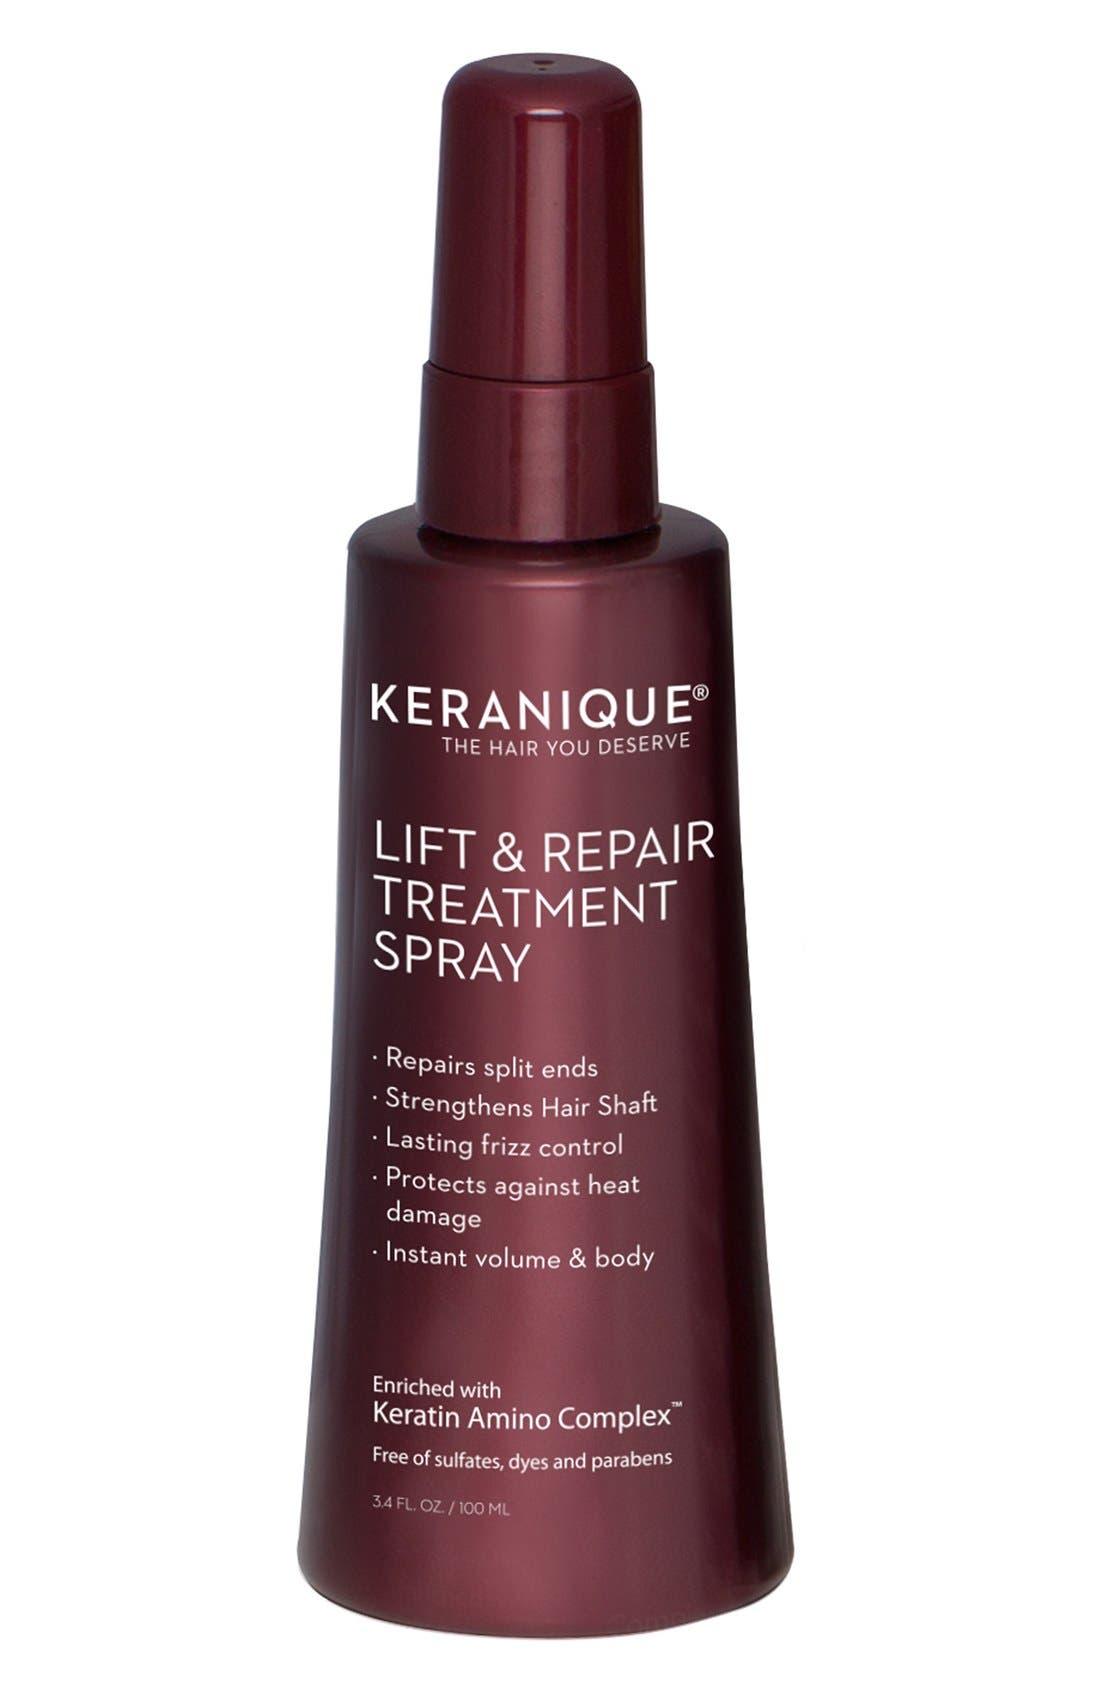 Lift & Repair Hair Treatment Spray,                             Main thumbnail 1, color,                             NO COLOR